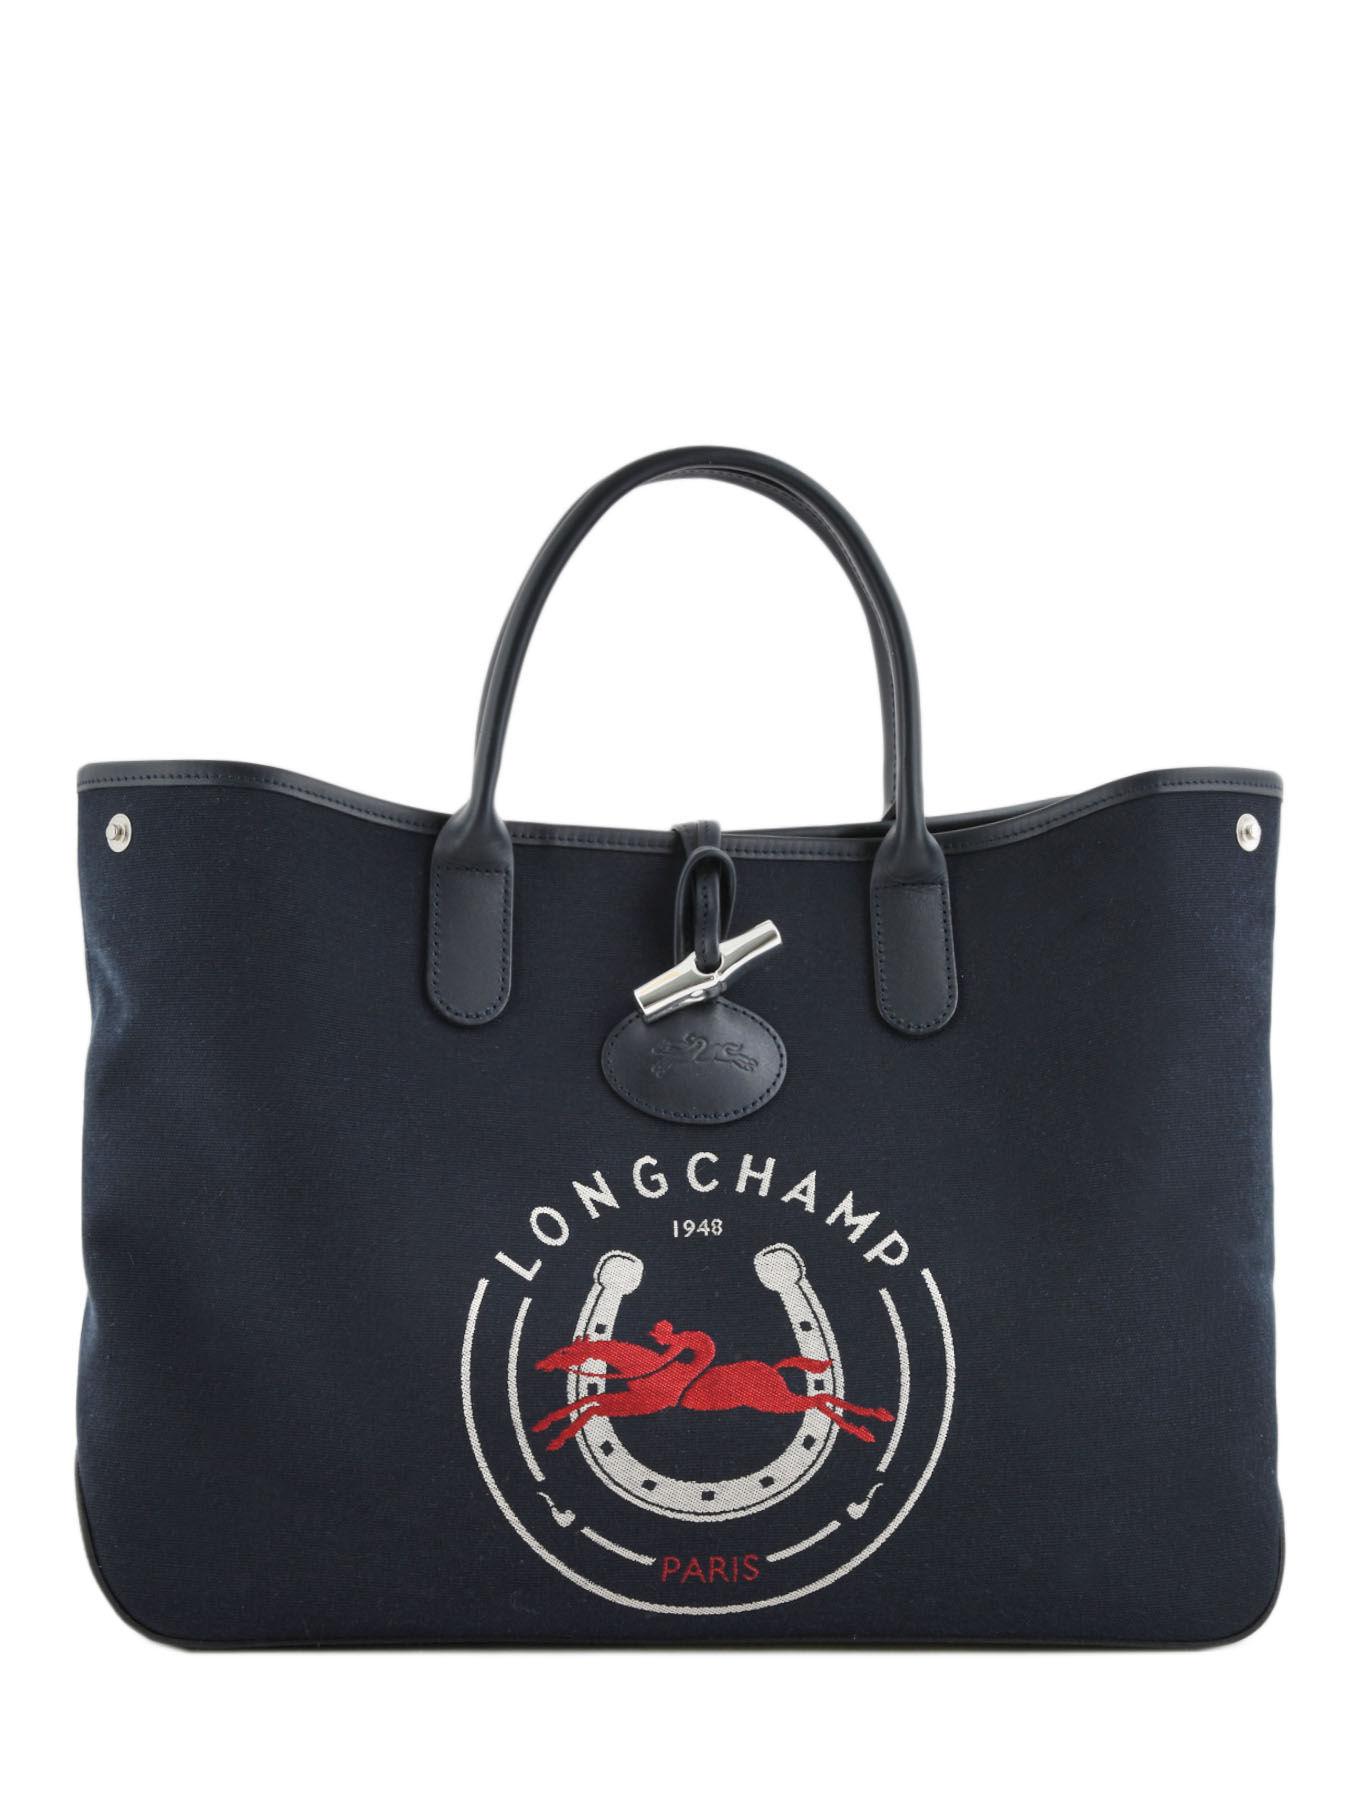 Sac Longchamp Roseau Fushia : Sac port main longchamp roseau